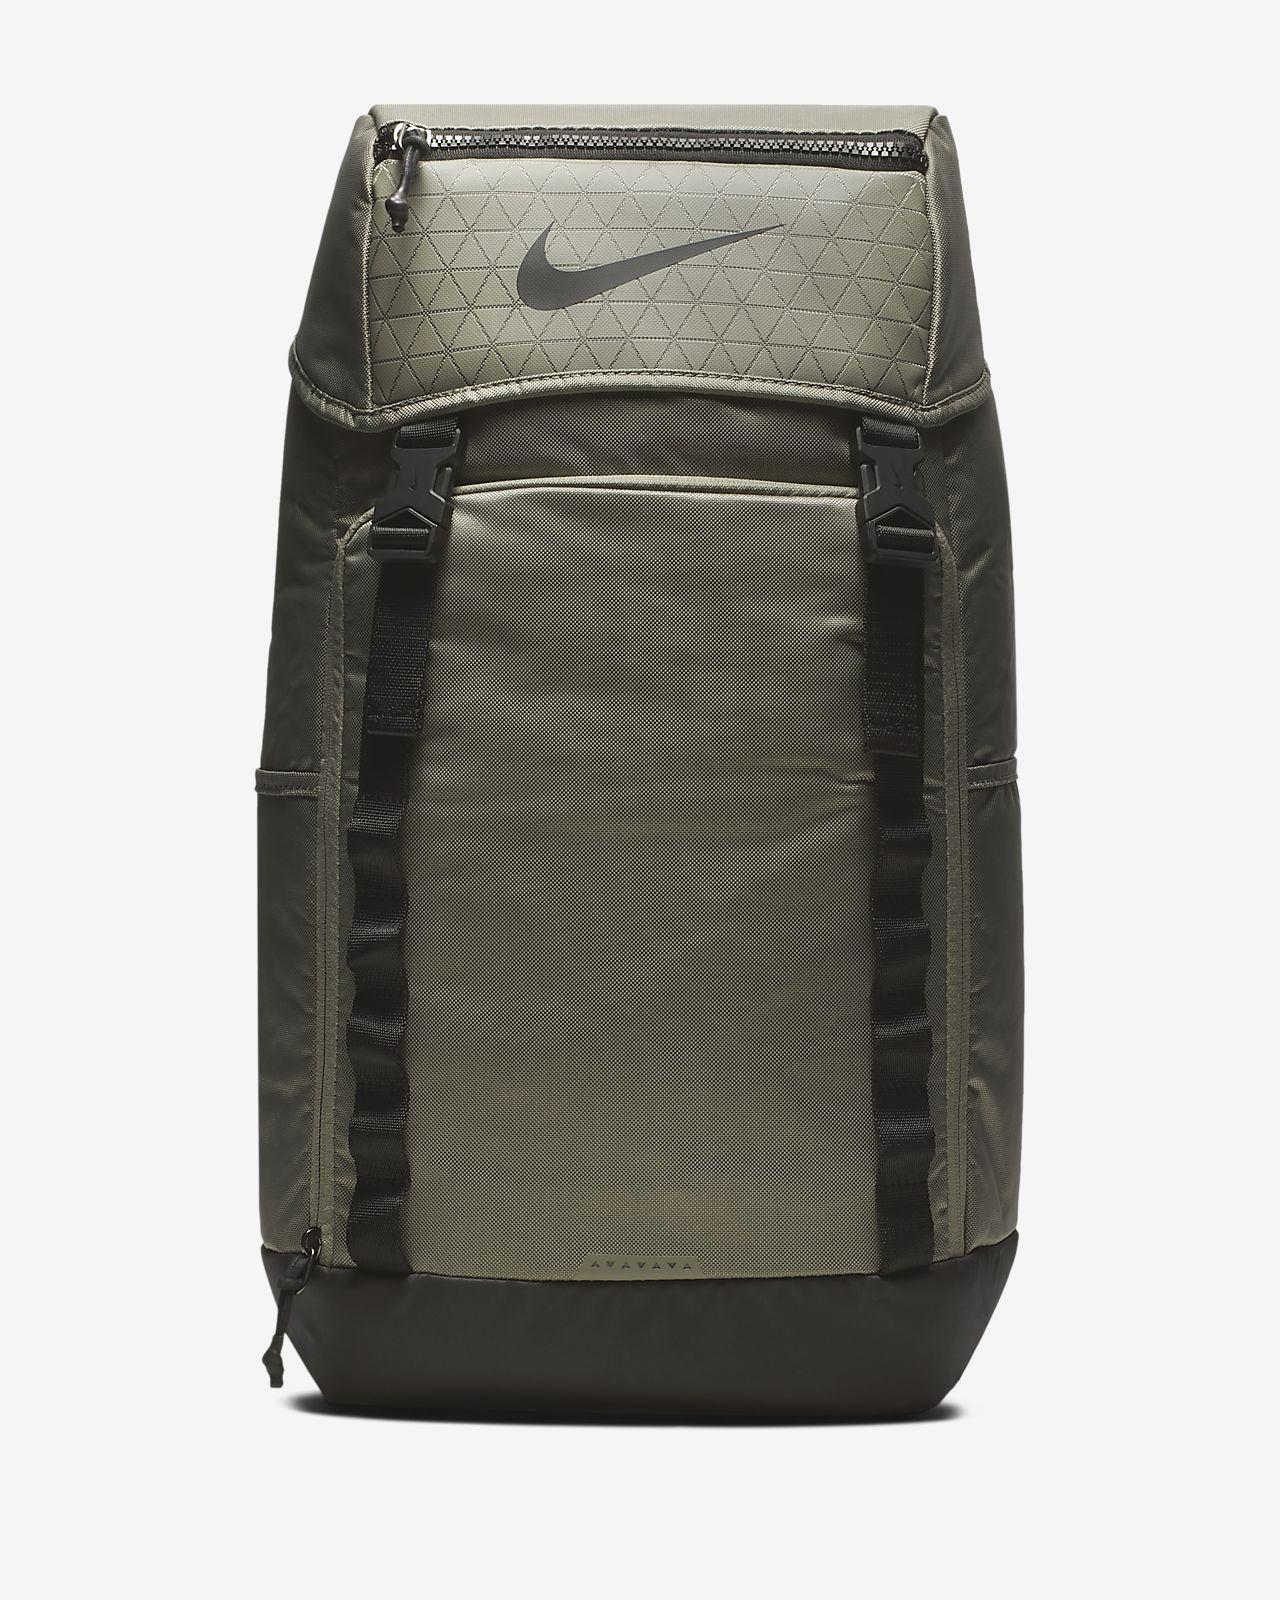 Nike Vapor Speed 2.0 訓練背包